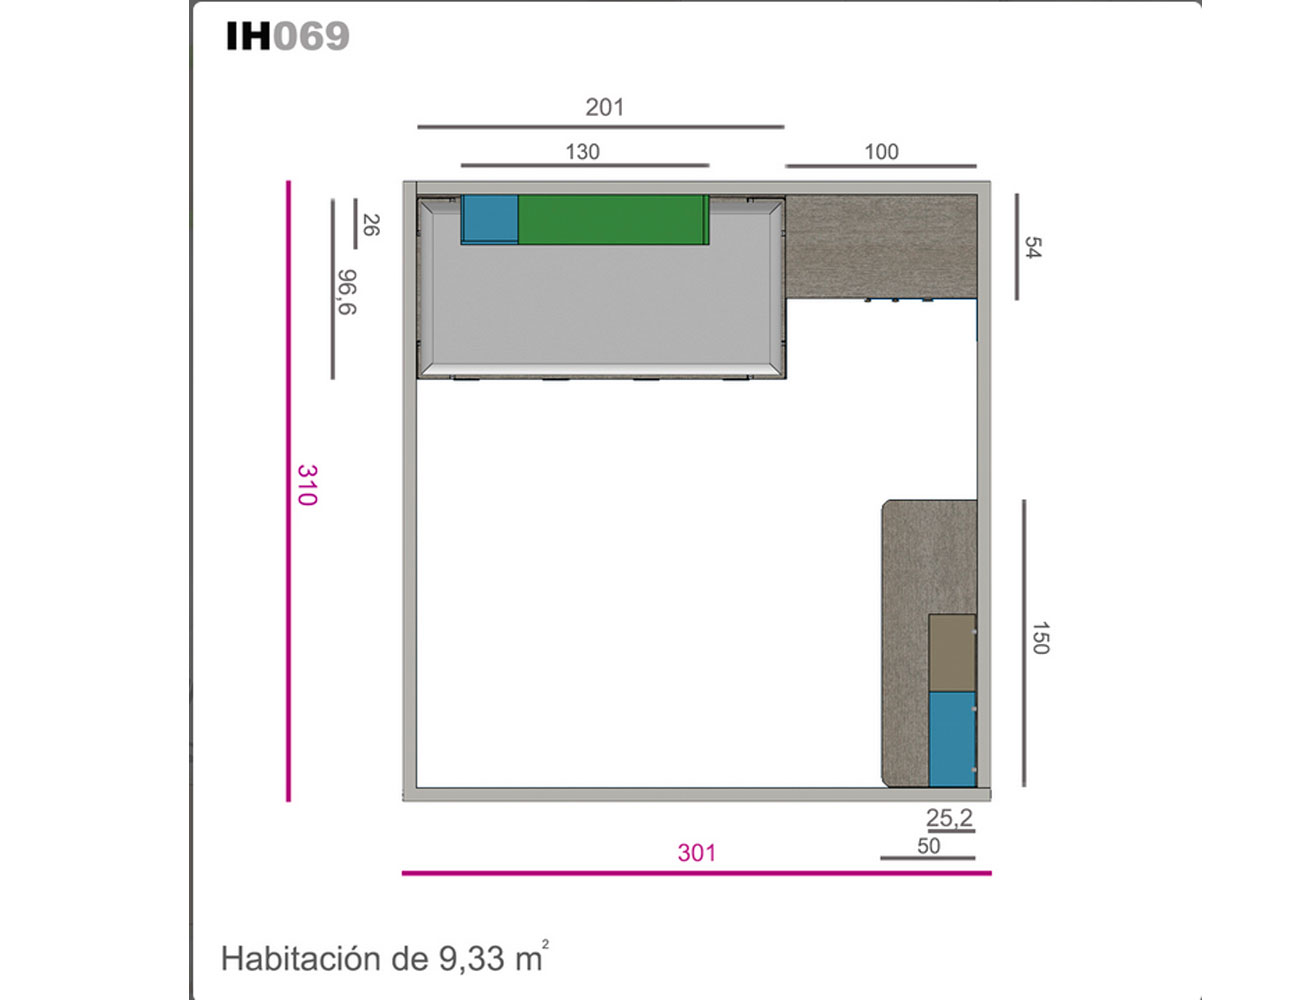 Ih069 medidas